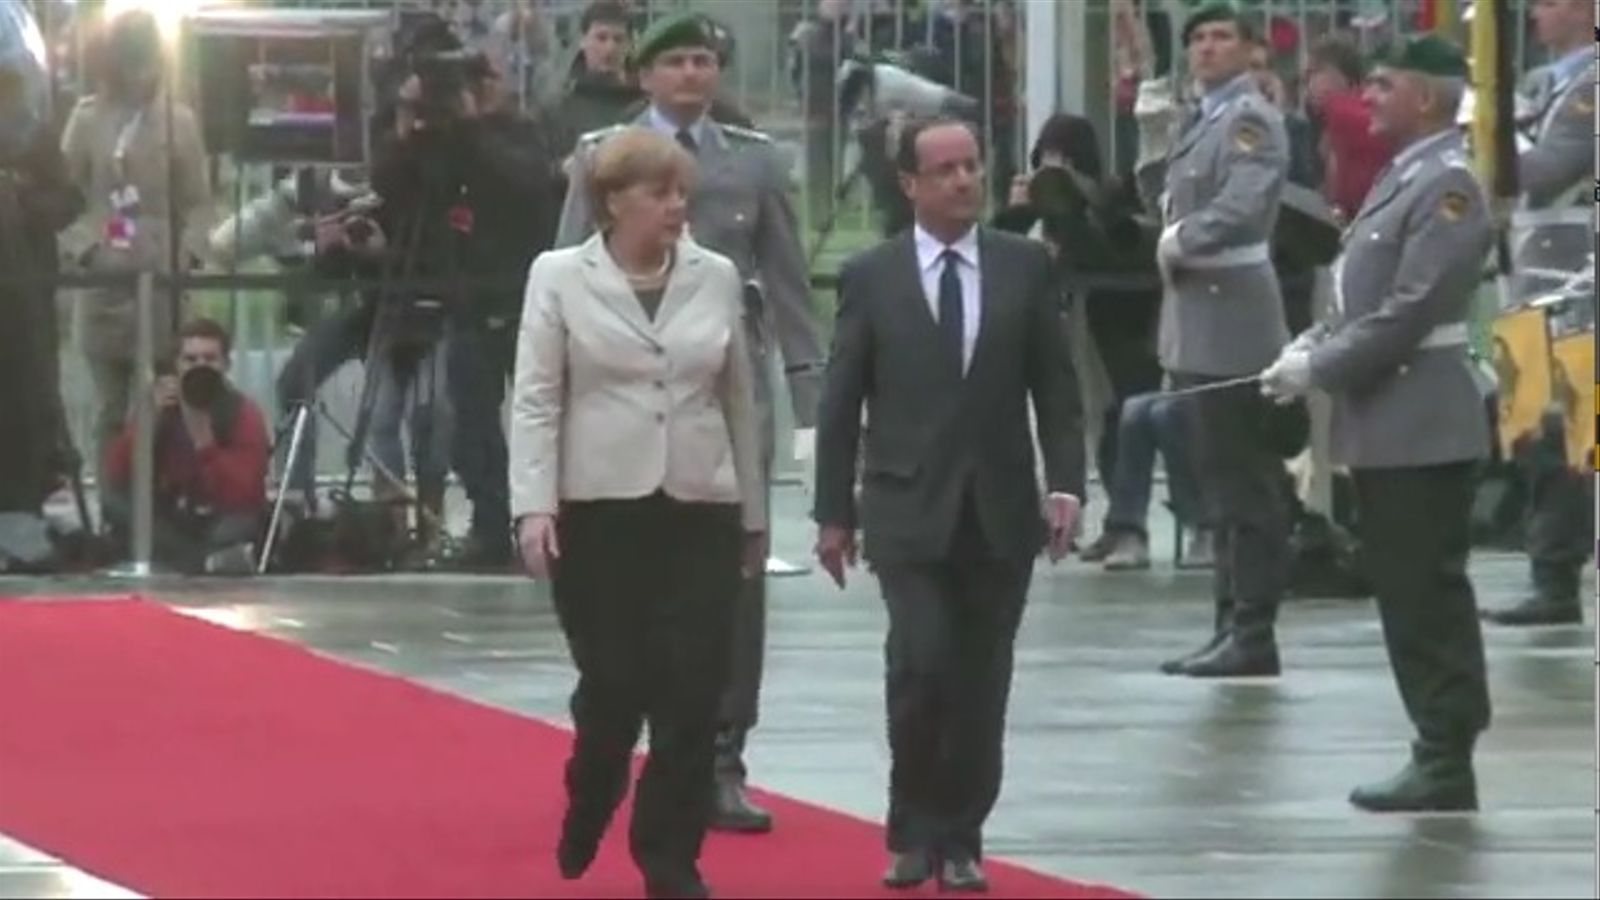 El pas vacil·lant d'Hollande davant Merkel